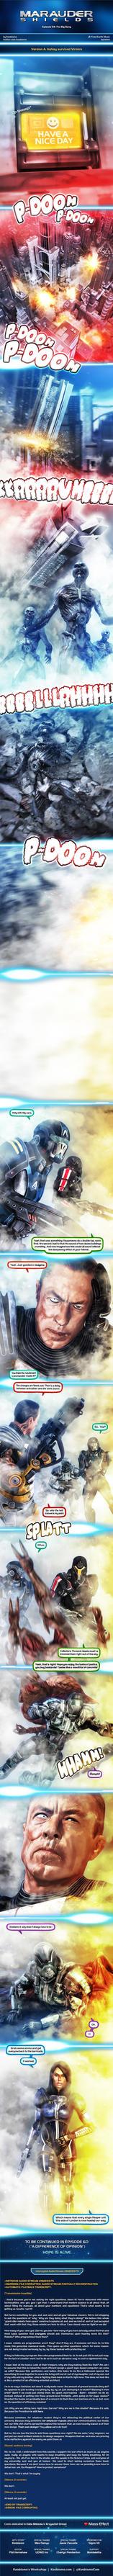 Marauder Shields 59: The Big Bang (Version A) by koobismo